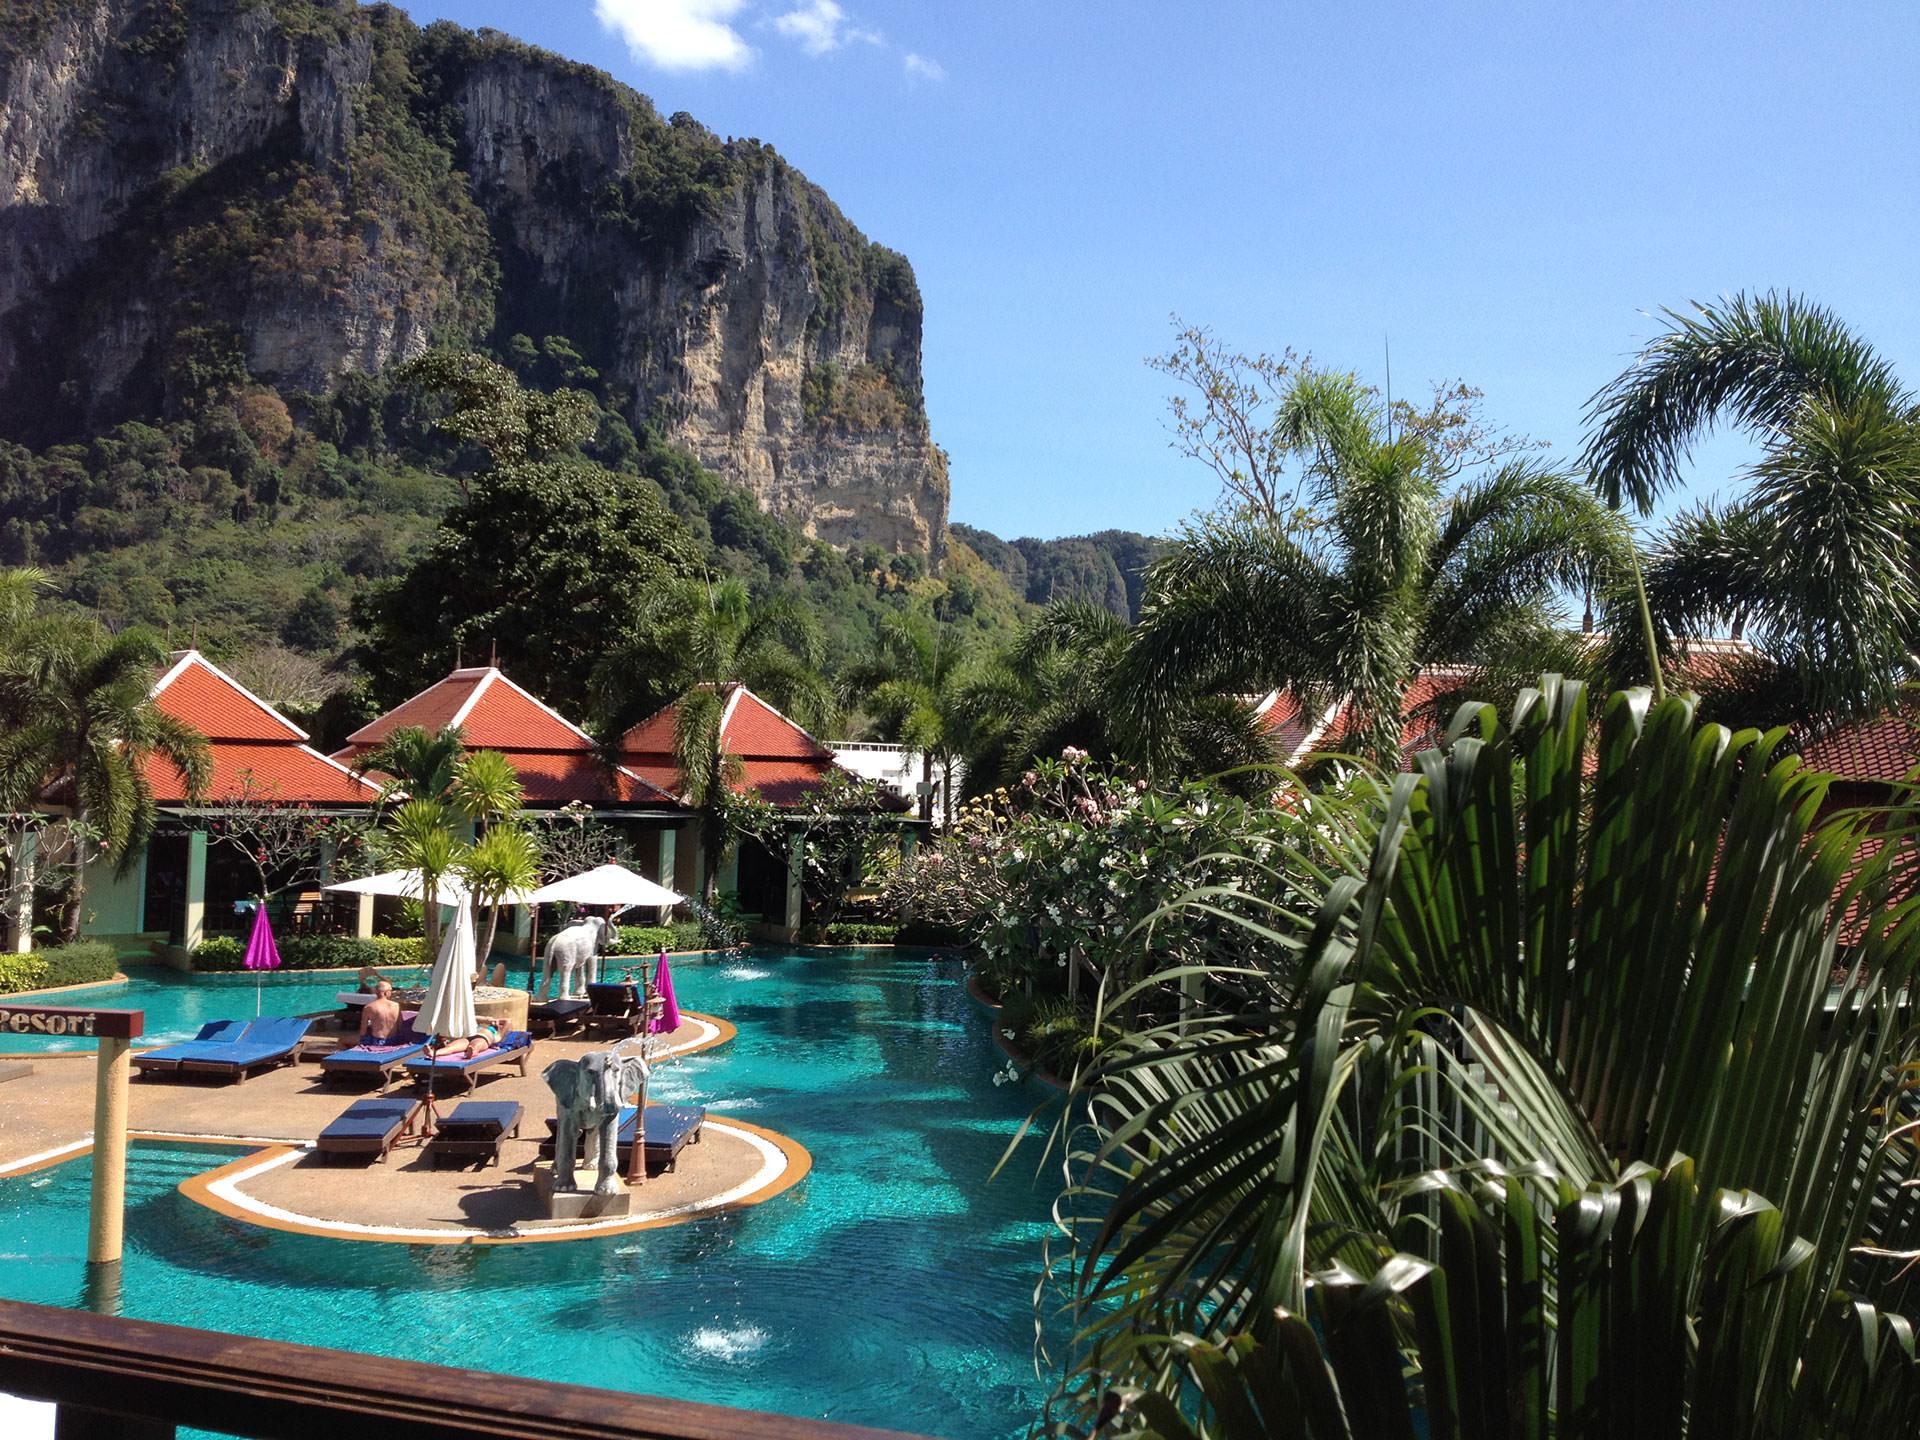 Recherche compagnon de voyage thailande